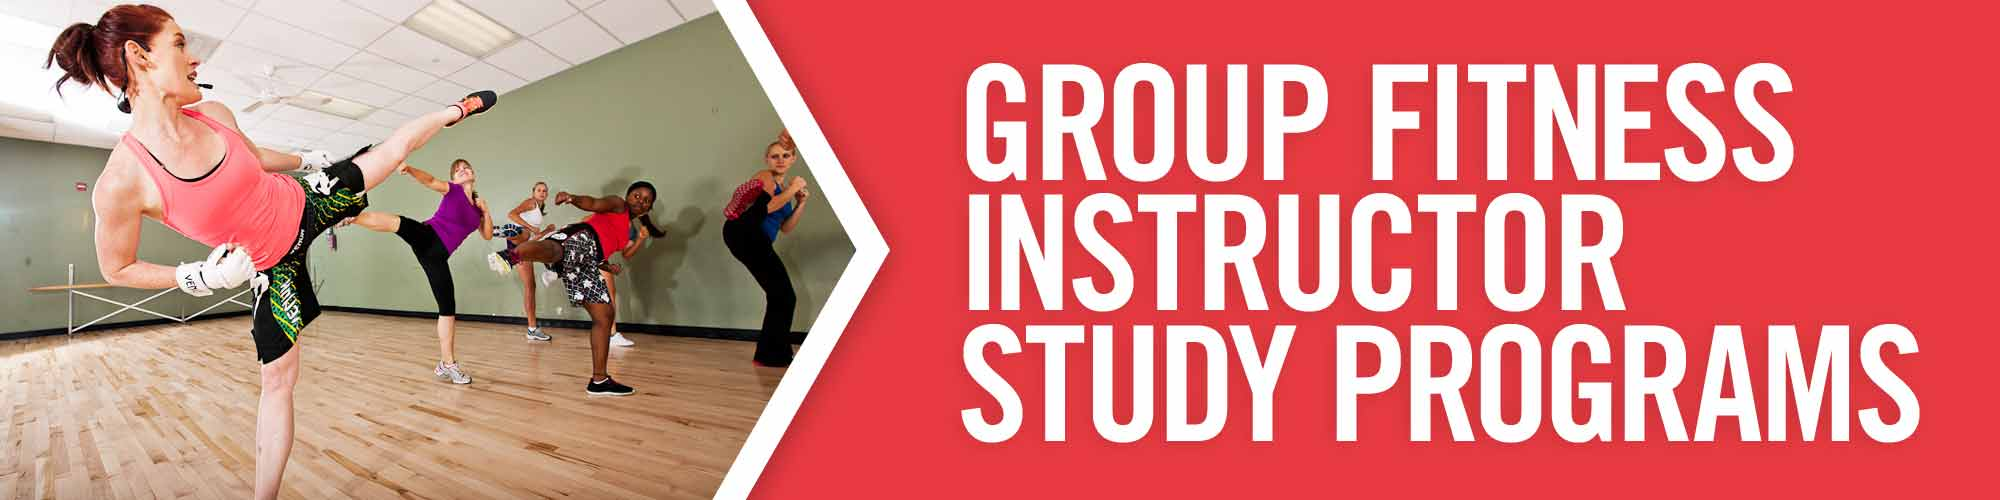 Group Fitness Instructor Study Bundles